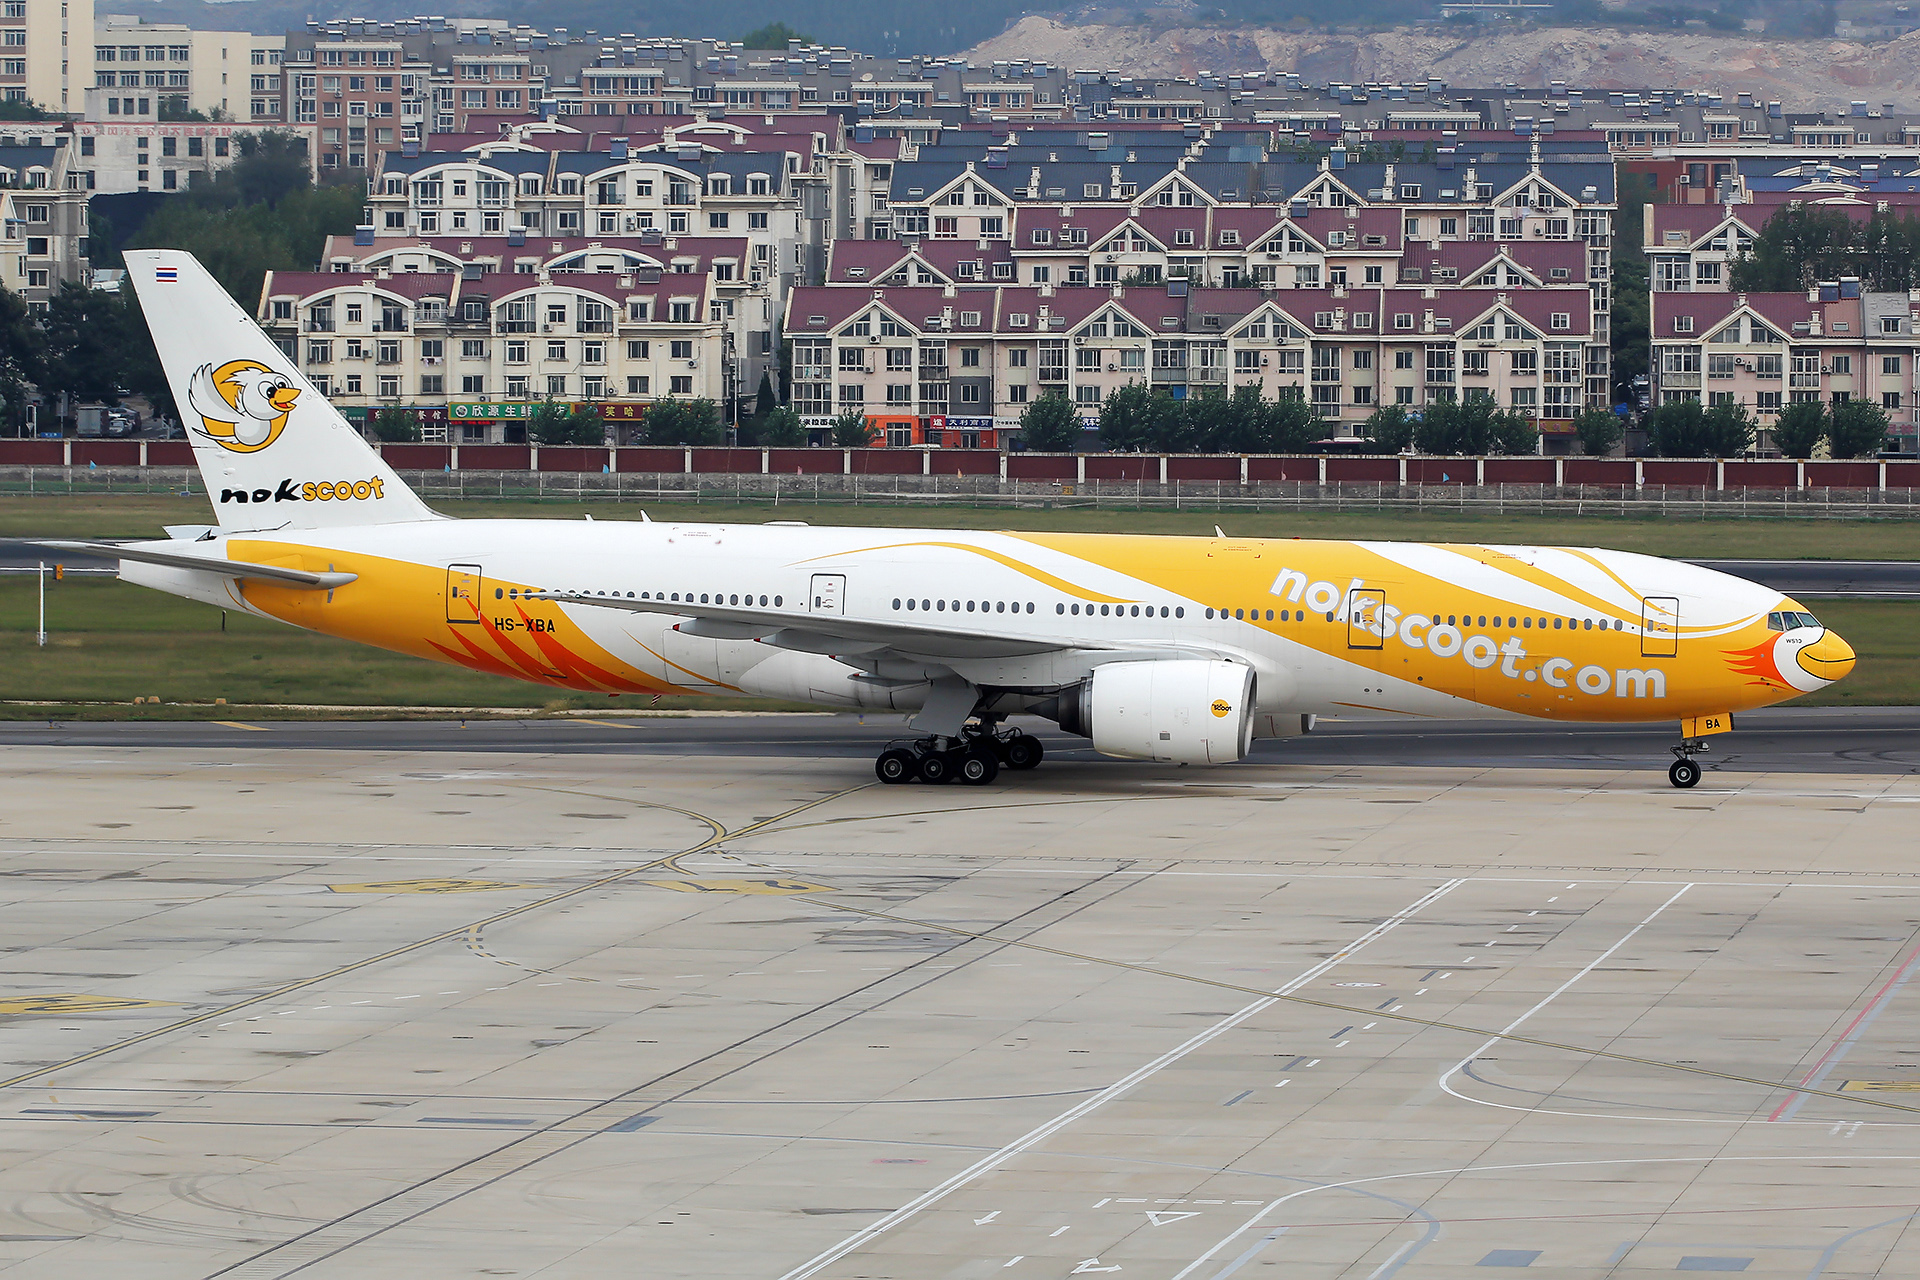 Re:[DLC]。。。酷鸟首航,落地反推未开,跑道口脱离。。。 BOEING 767-200ER HS-XBA 中国大连国际机场